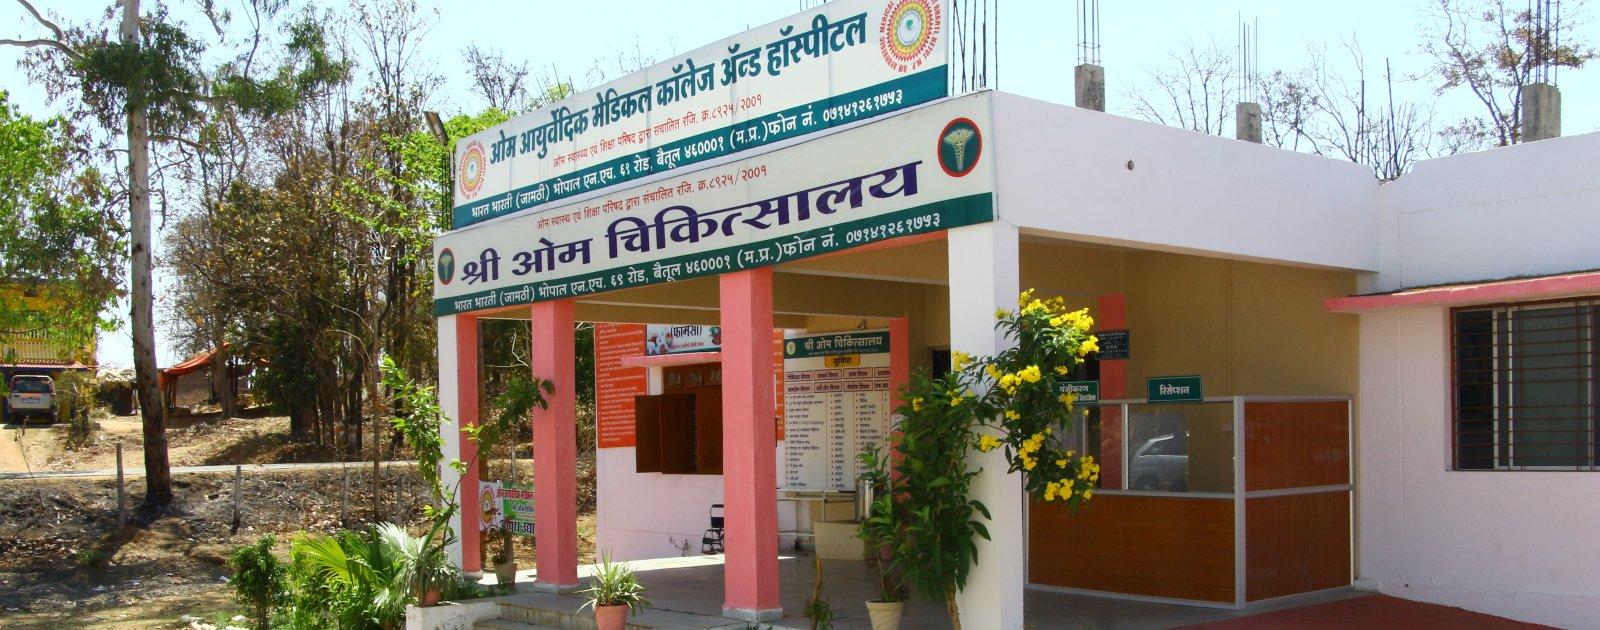 Om Ayurvedic Medical College and Hospital, Betul